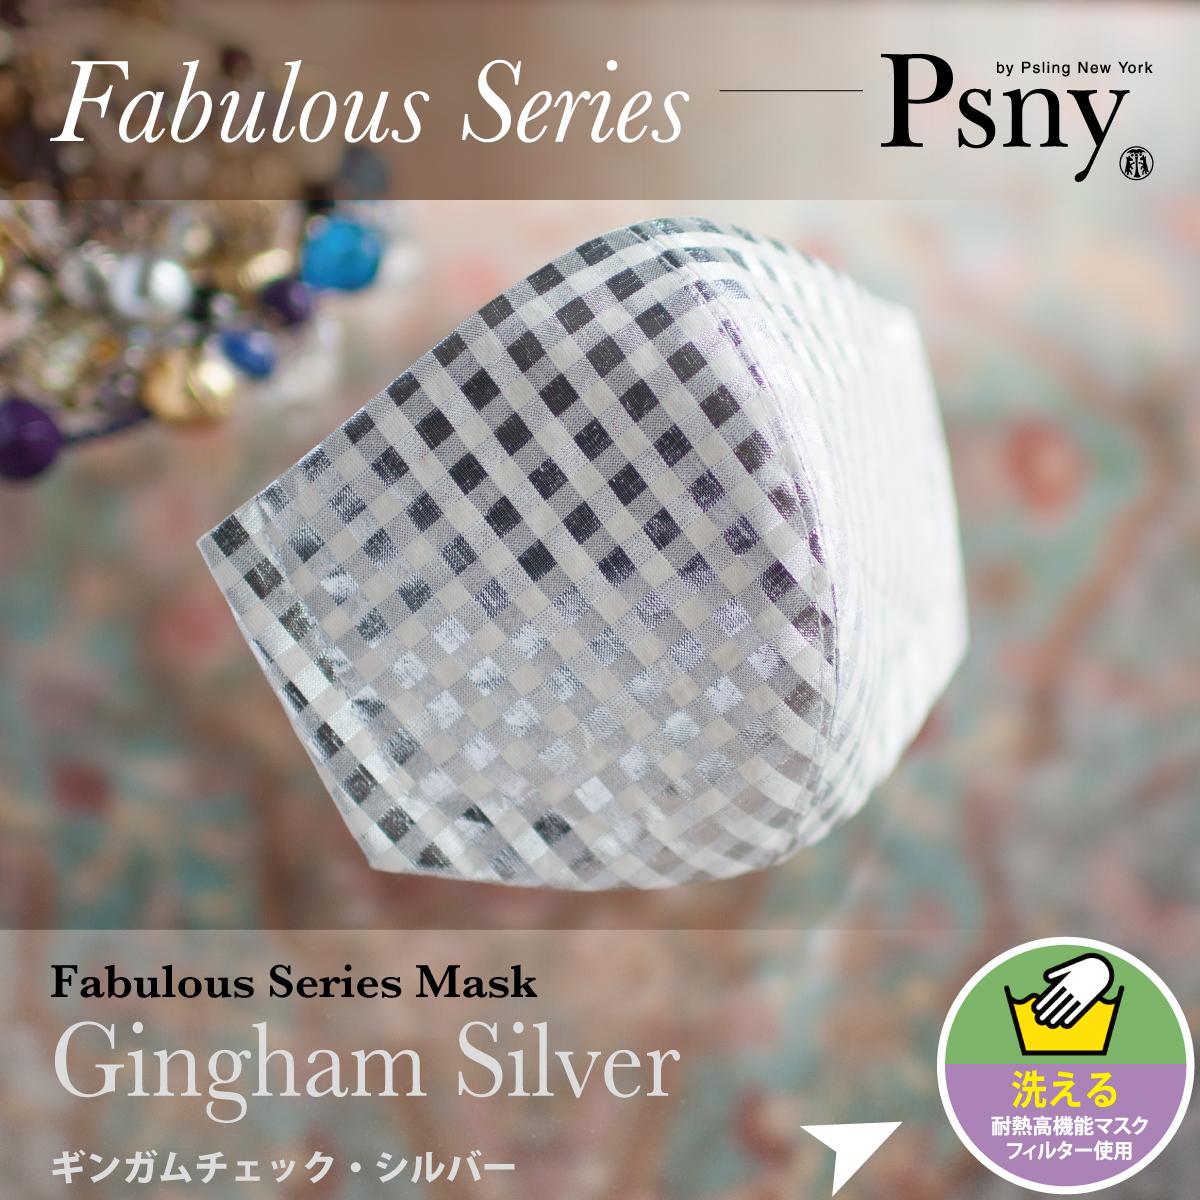 PSNY ギンガムチェック・シルバー 花粉 洗える不織布フィルター入り 立体 大人 高級 美しい 光沢 マスク 送料無料 GH1